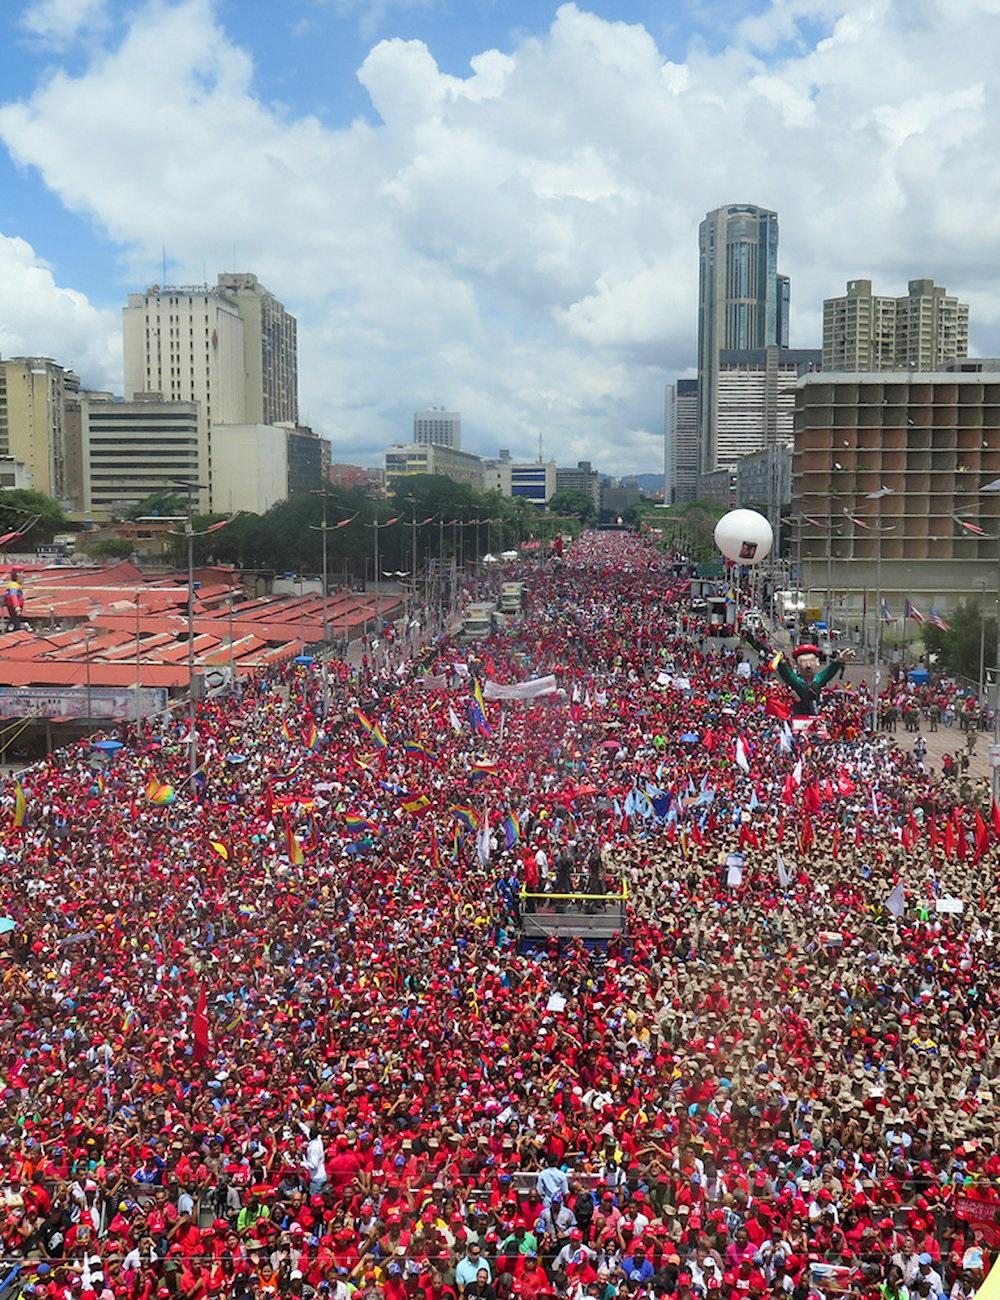 00 venezuela chavismo supporters 030916